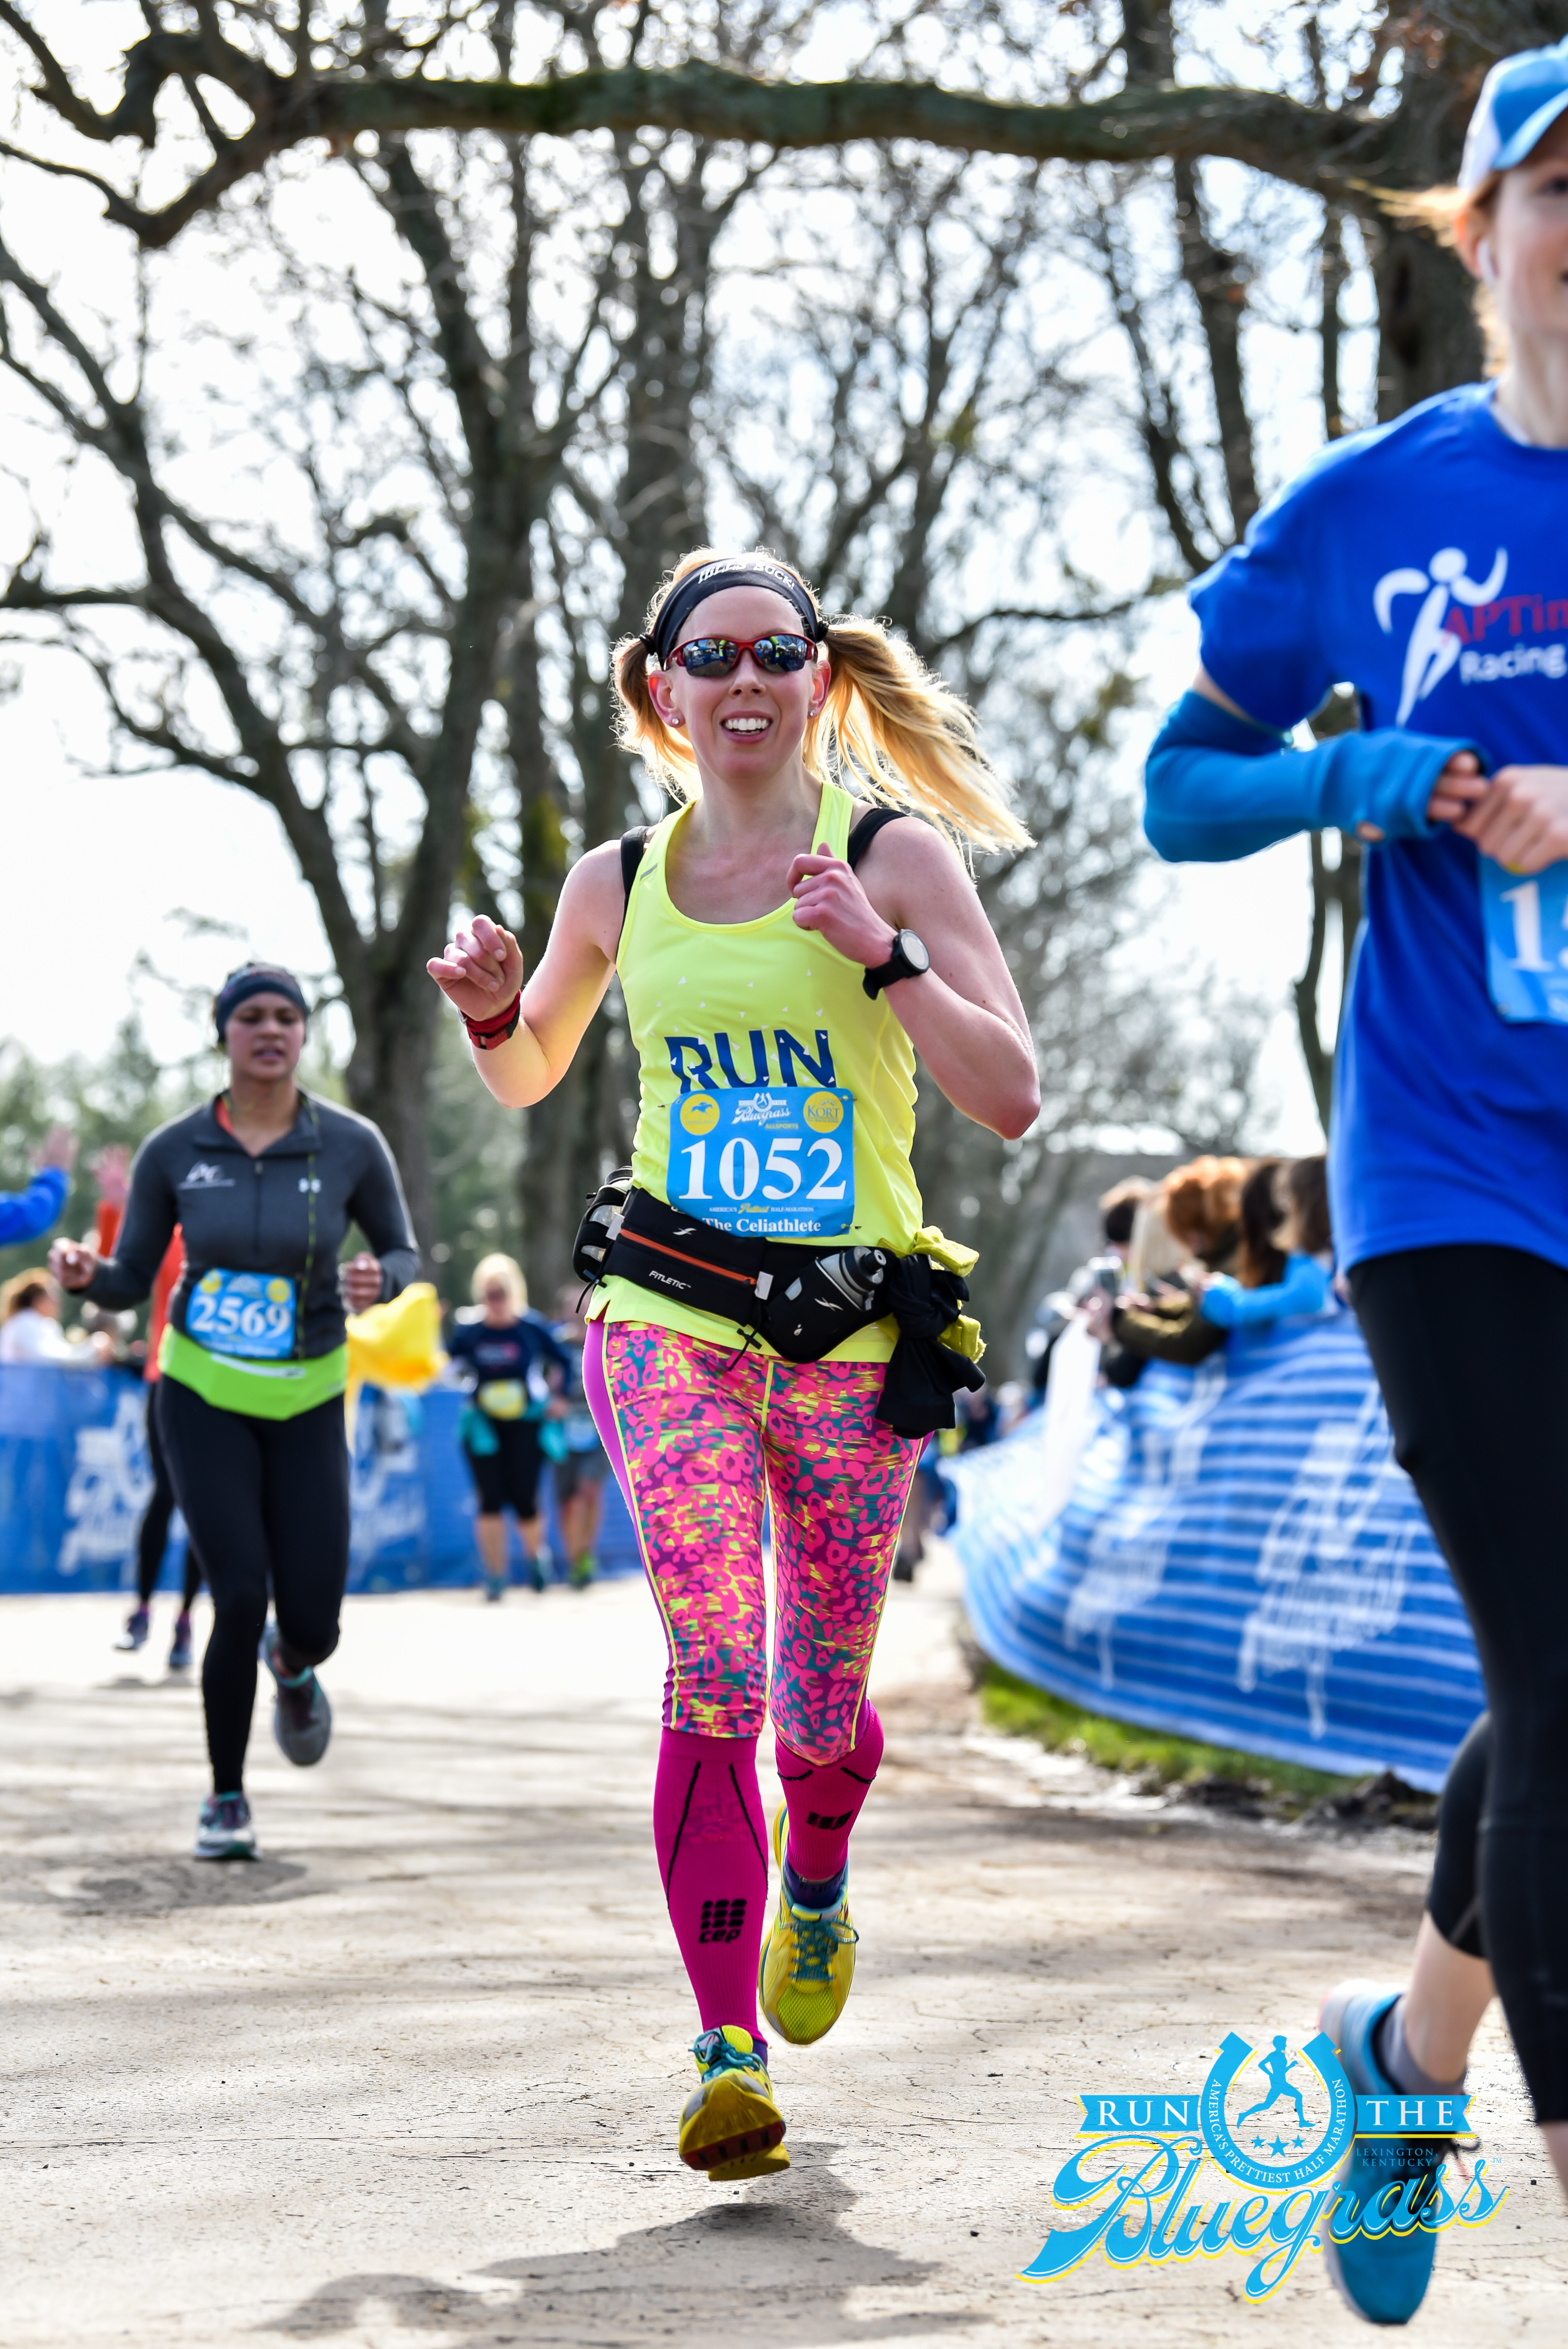 Run The Bluegrass Half Marathon - Lexington, KY (March 31